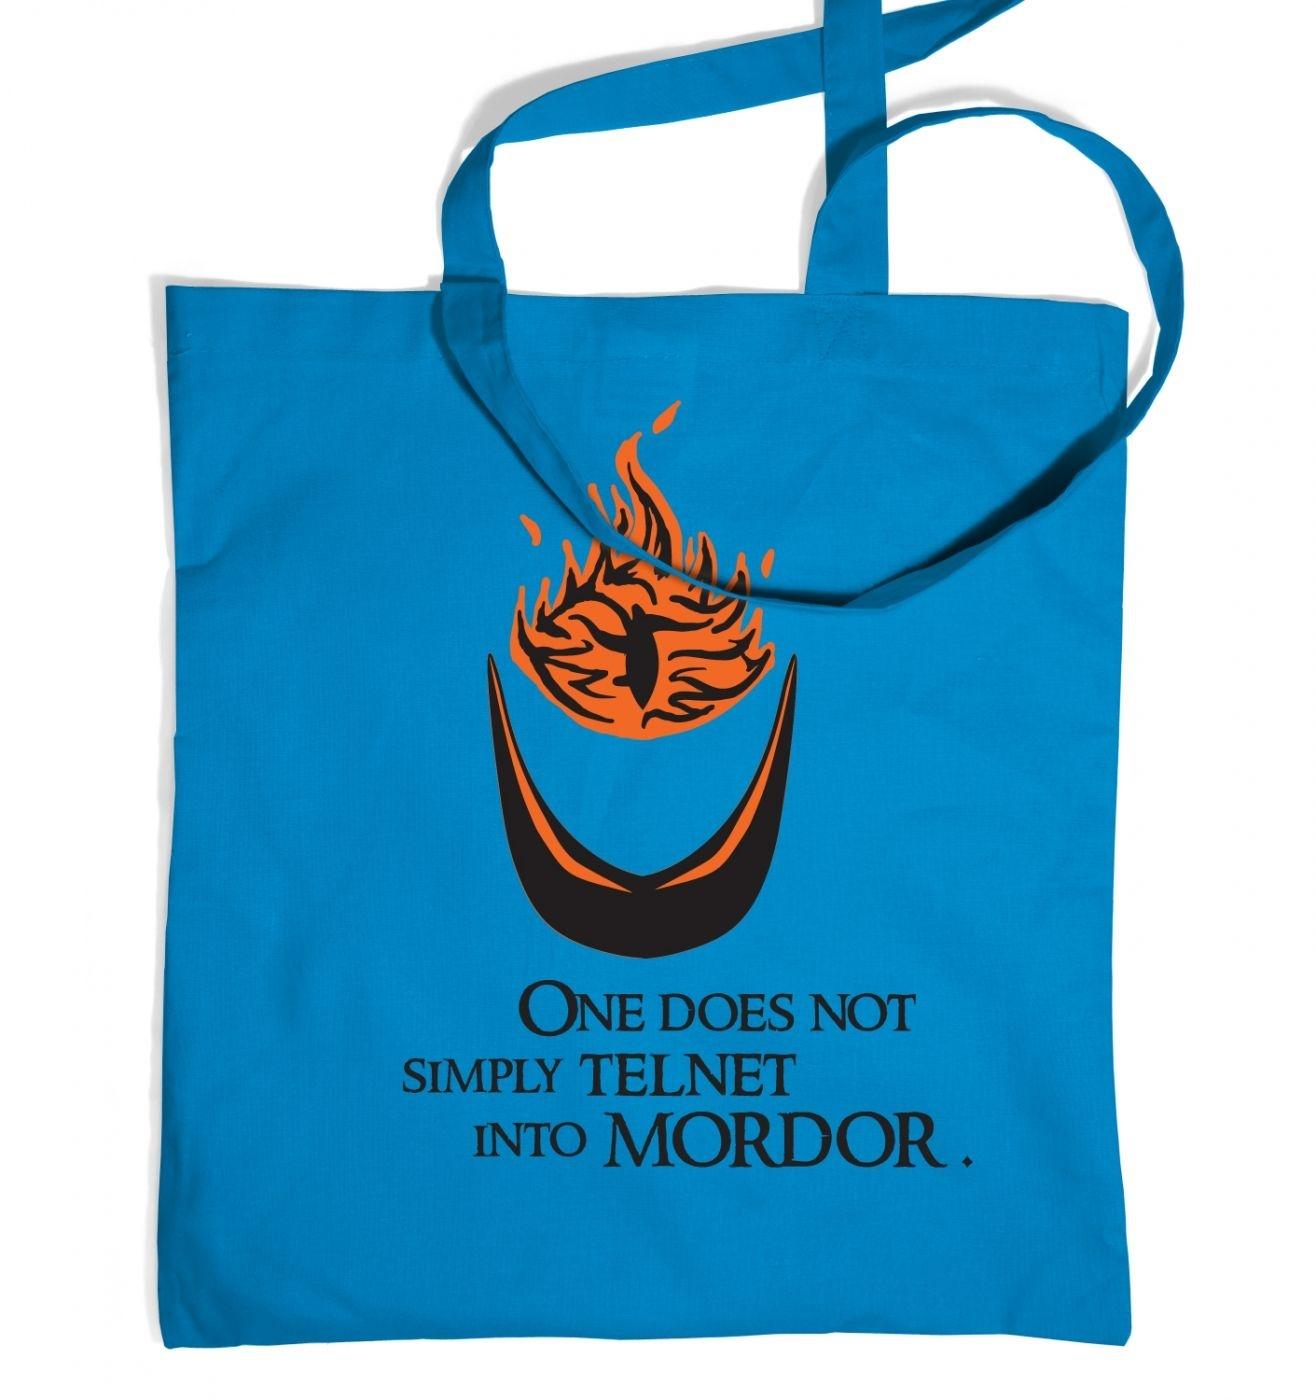 Telnet into Mordor tote bag